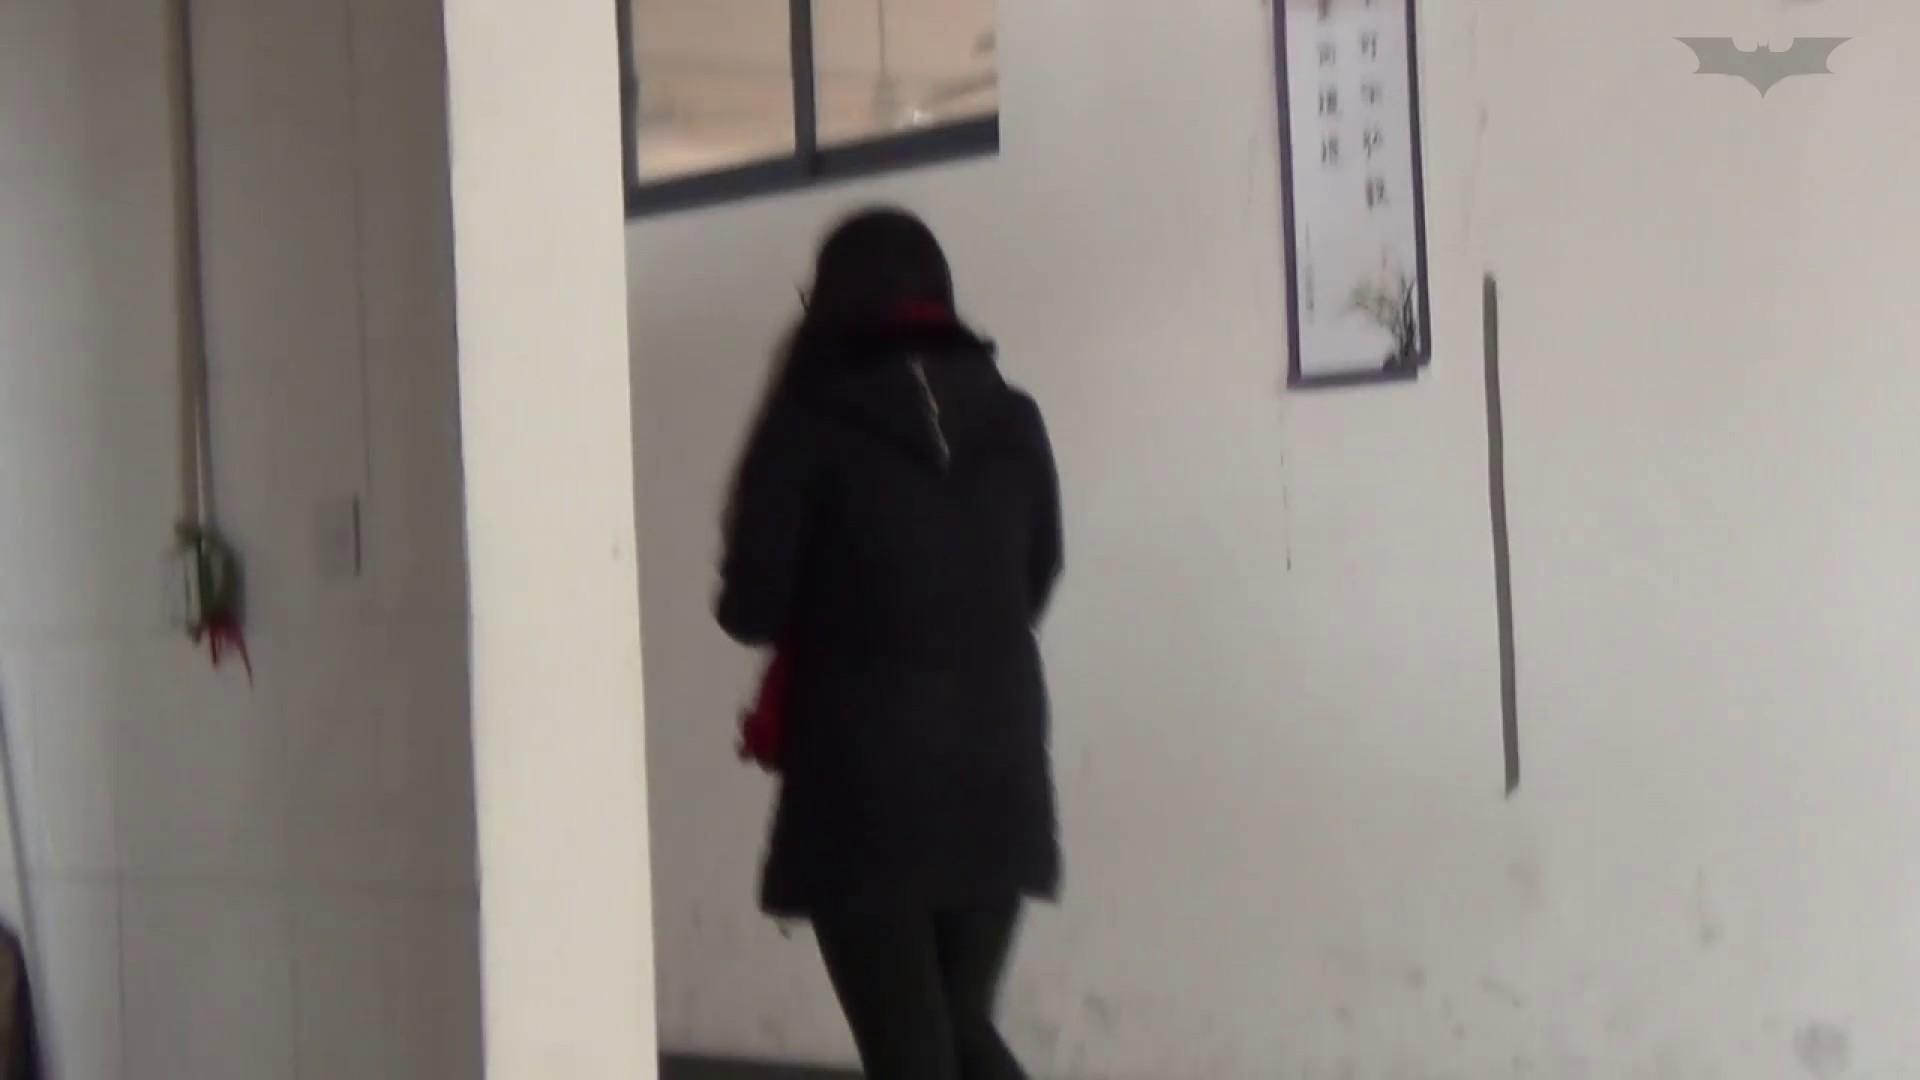 JD盗撮 美女の洗面所の秘密 Vol.45 女性トイレ AV動画キャプチャ 75pic 17